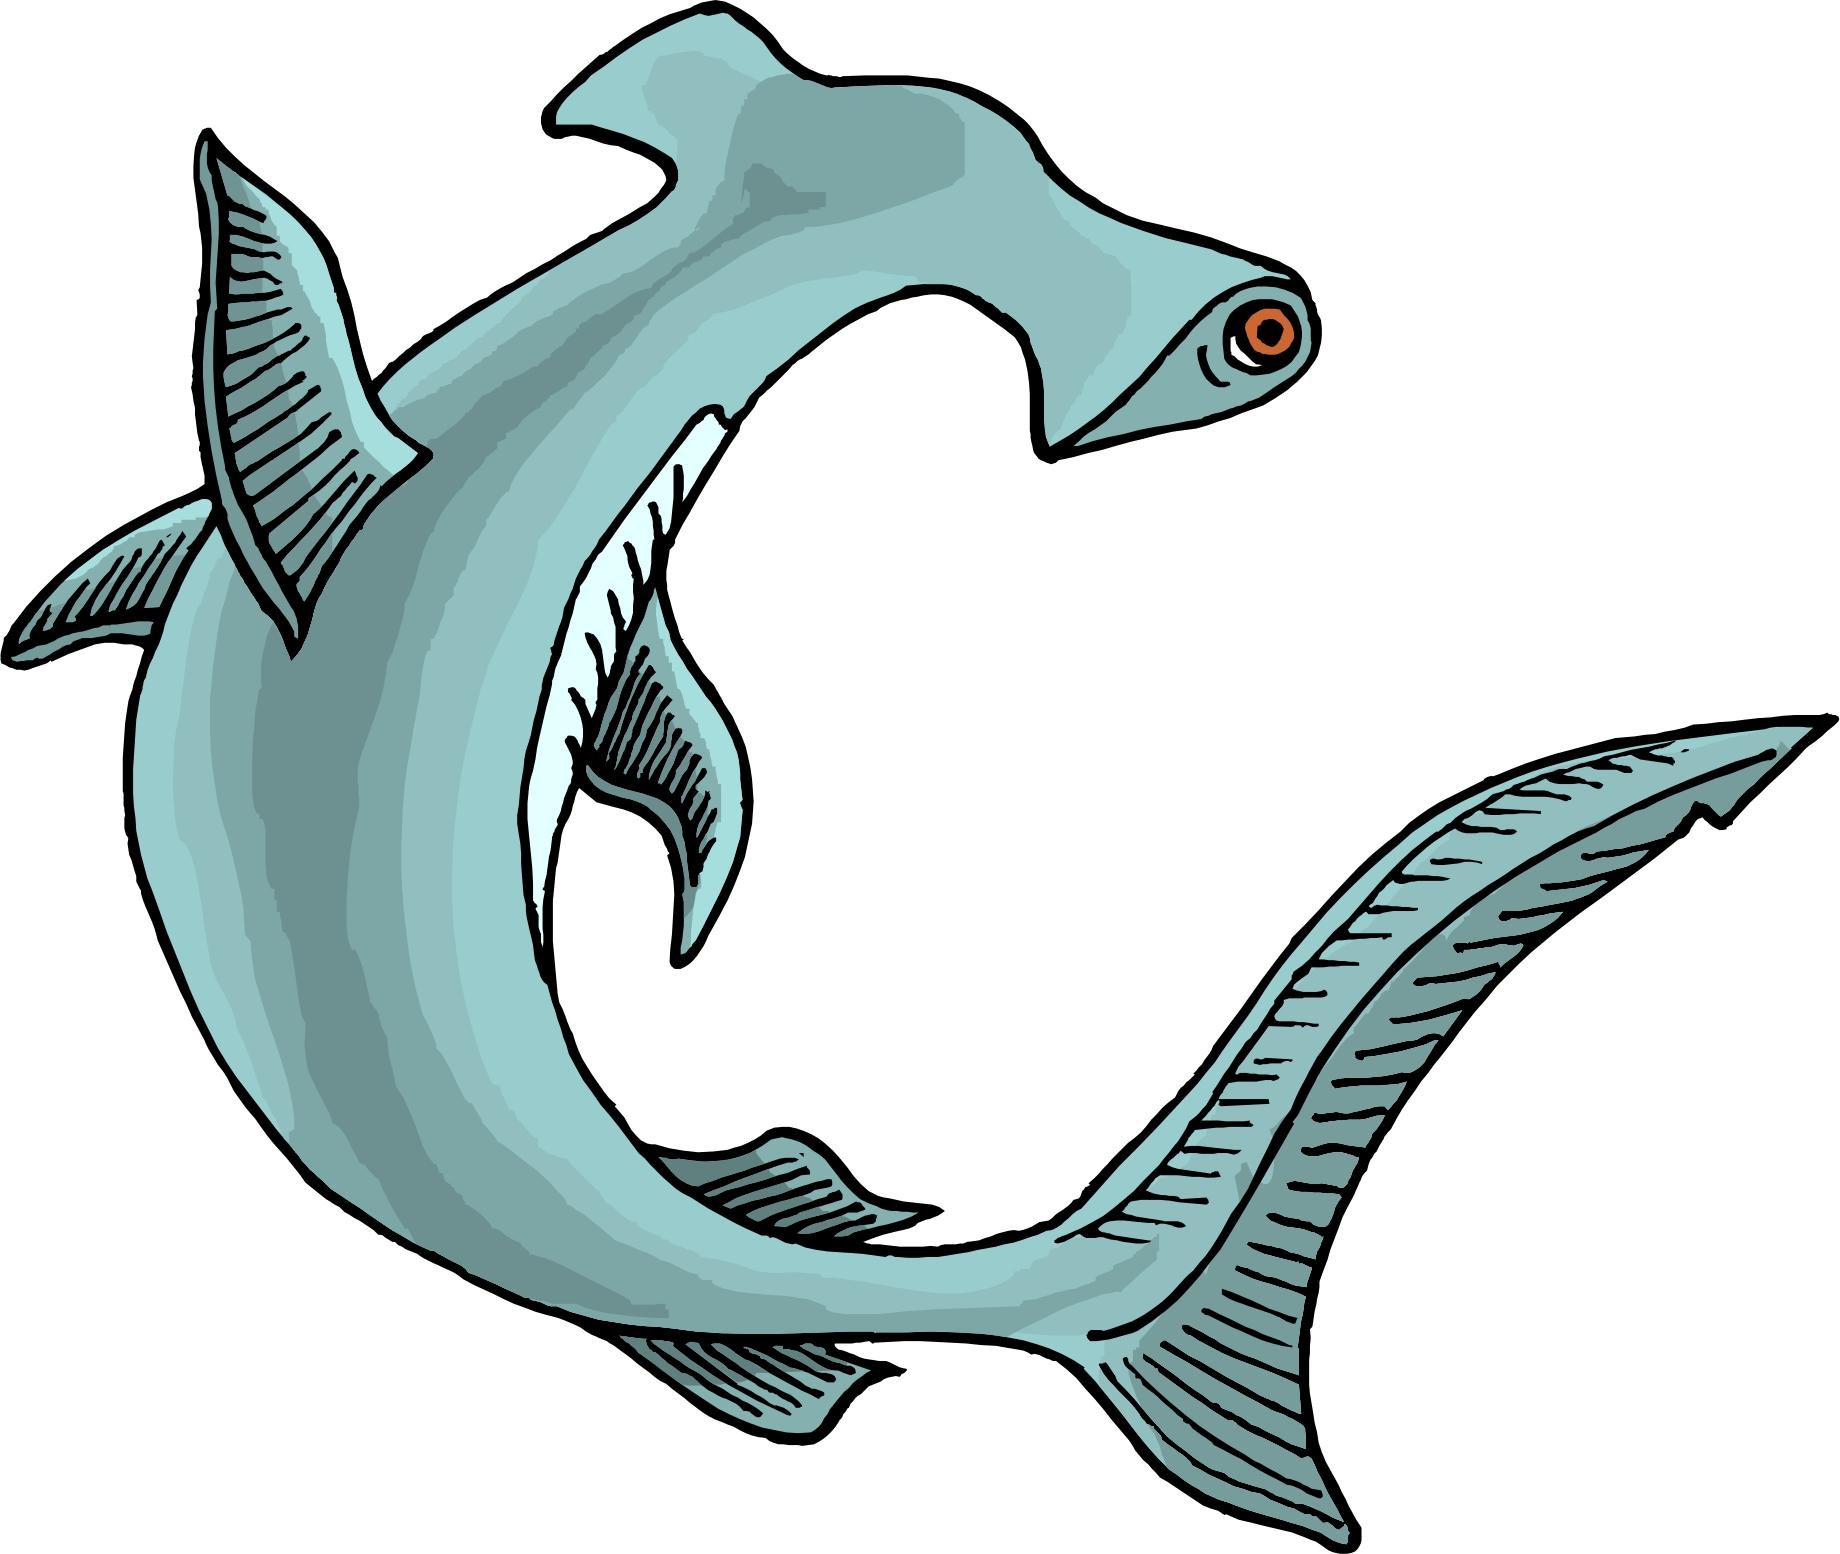 free animated shark clipart - photo #32